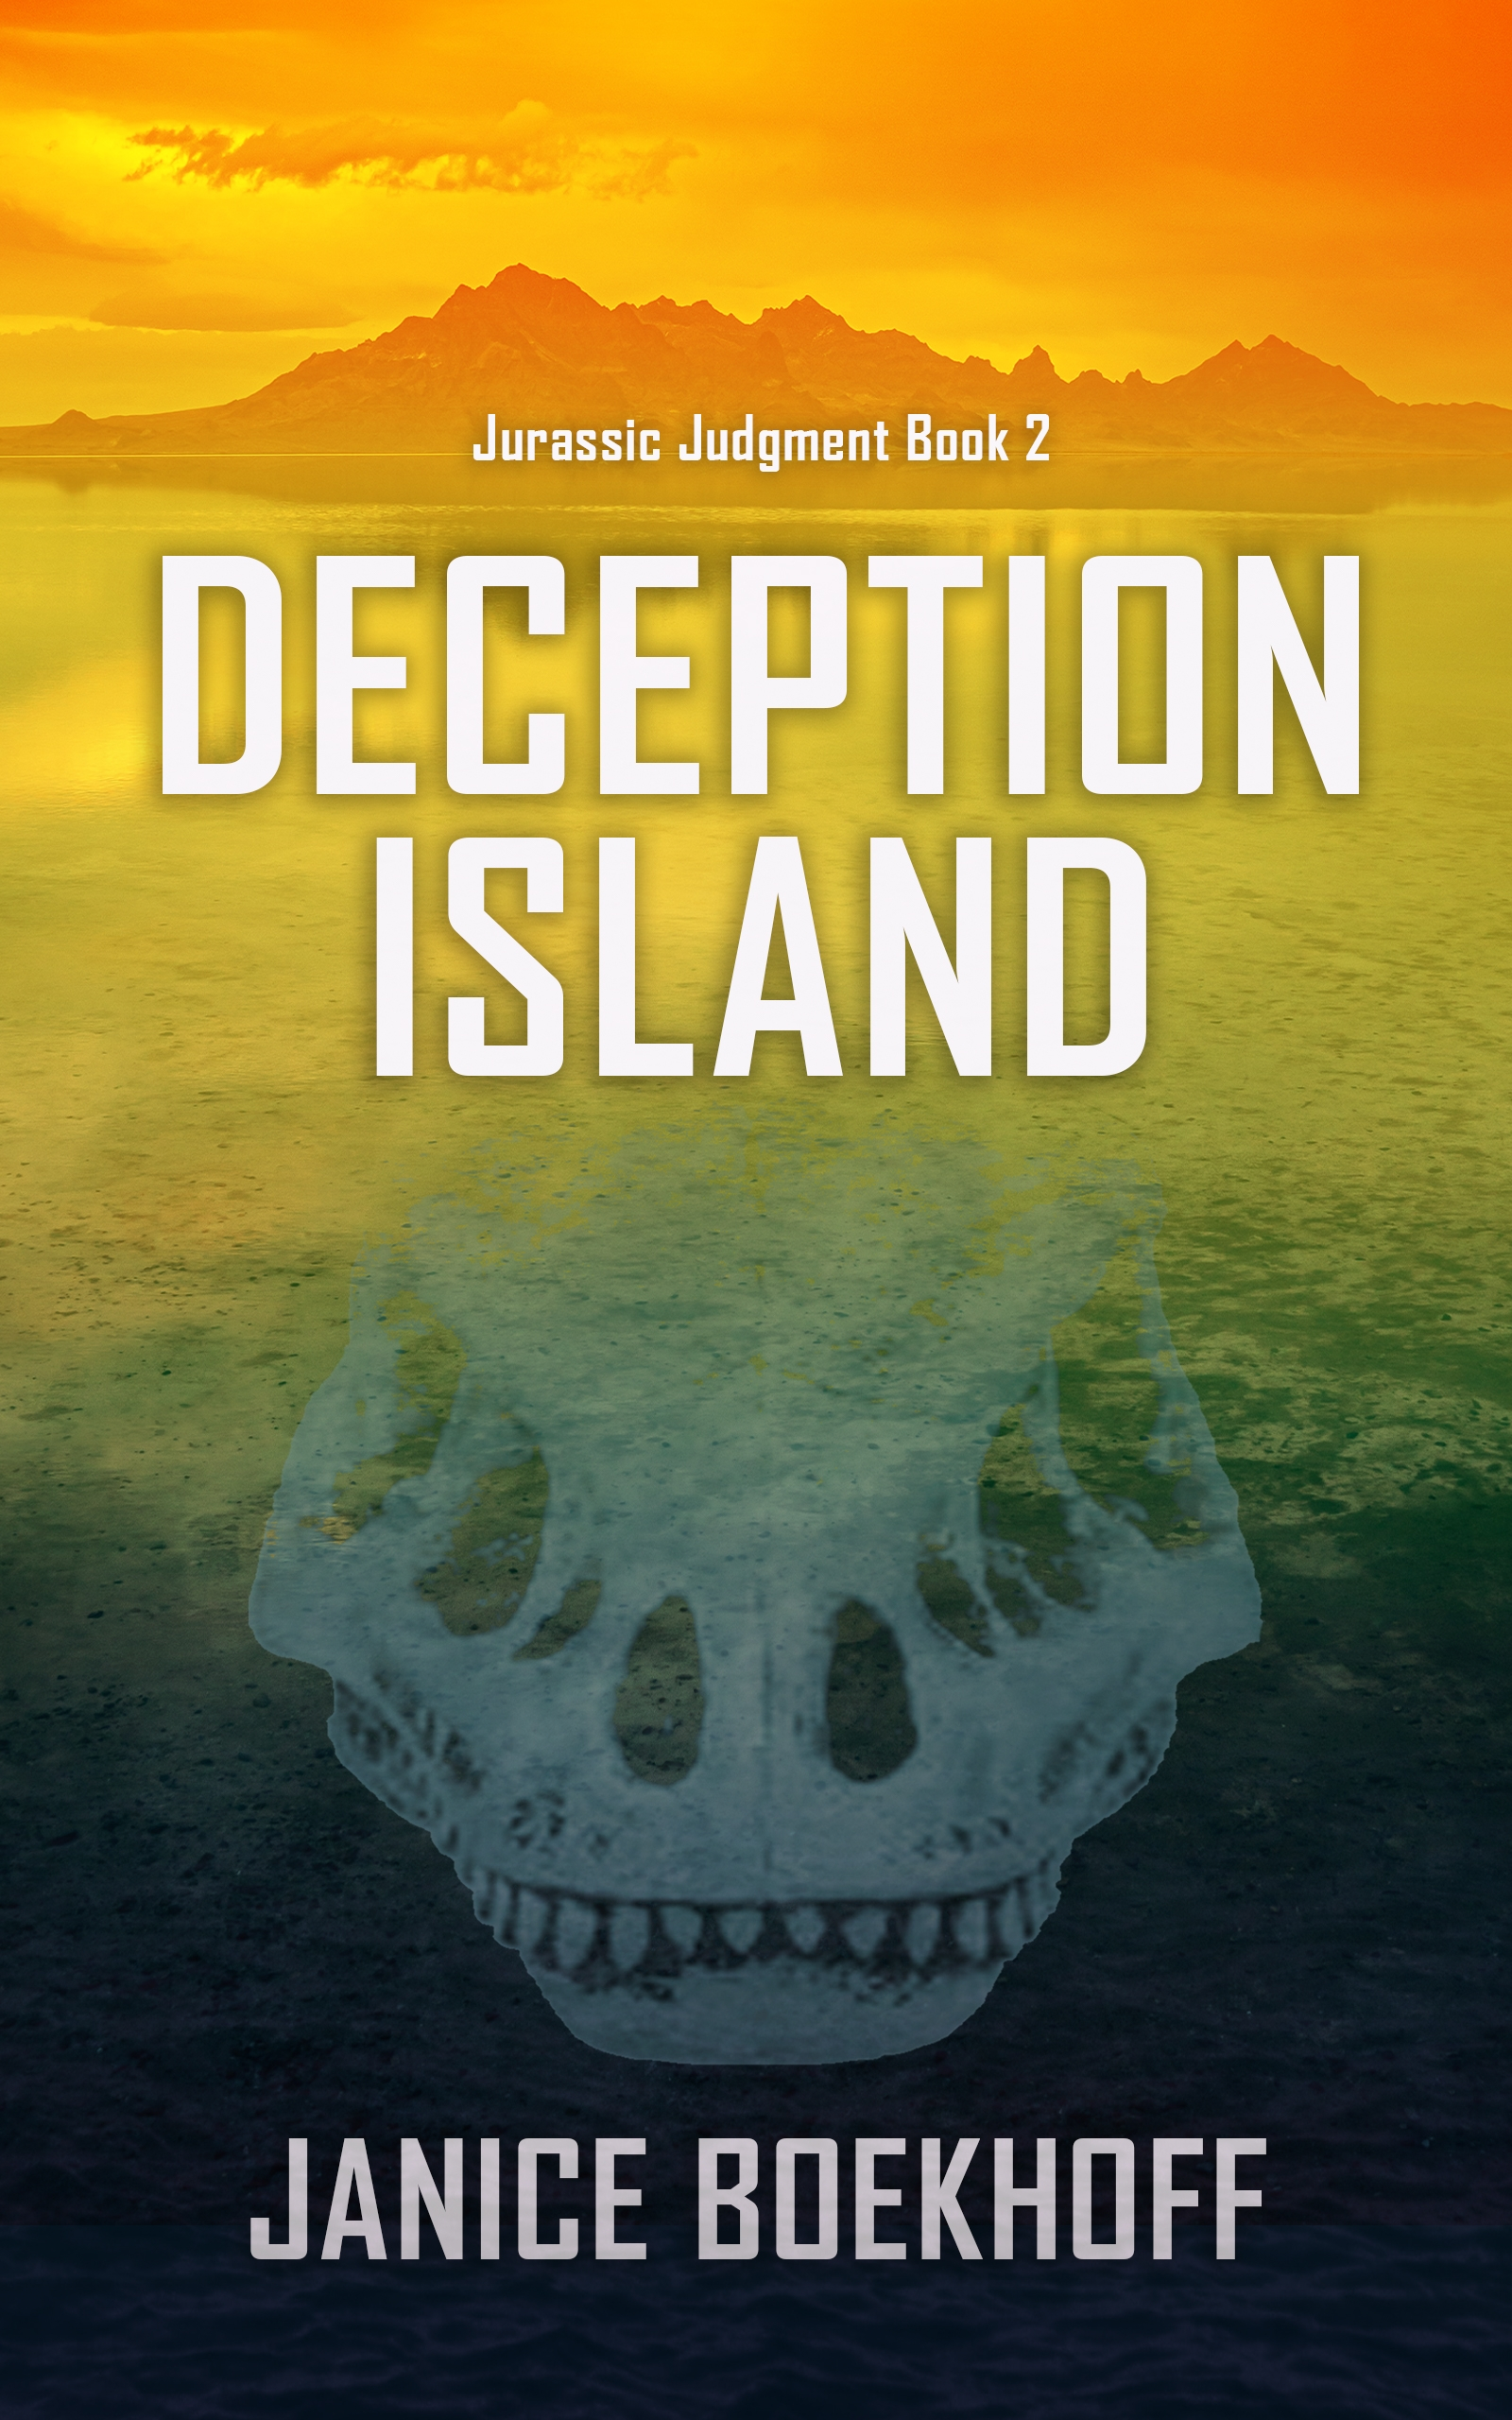 Deception Island by Author Janice Boekhoff